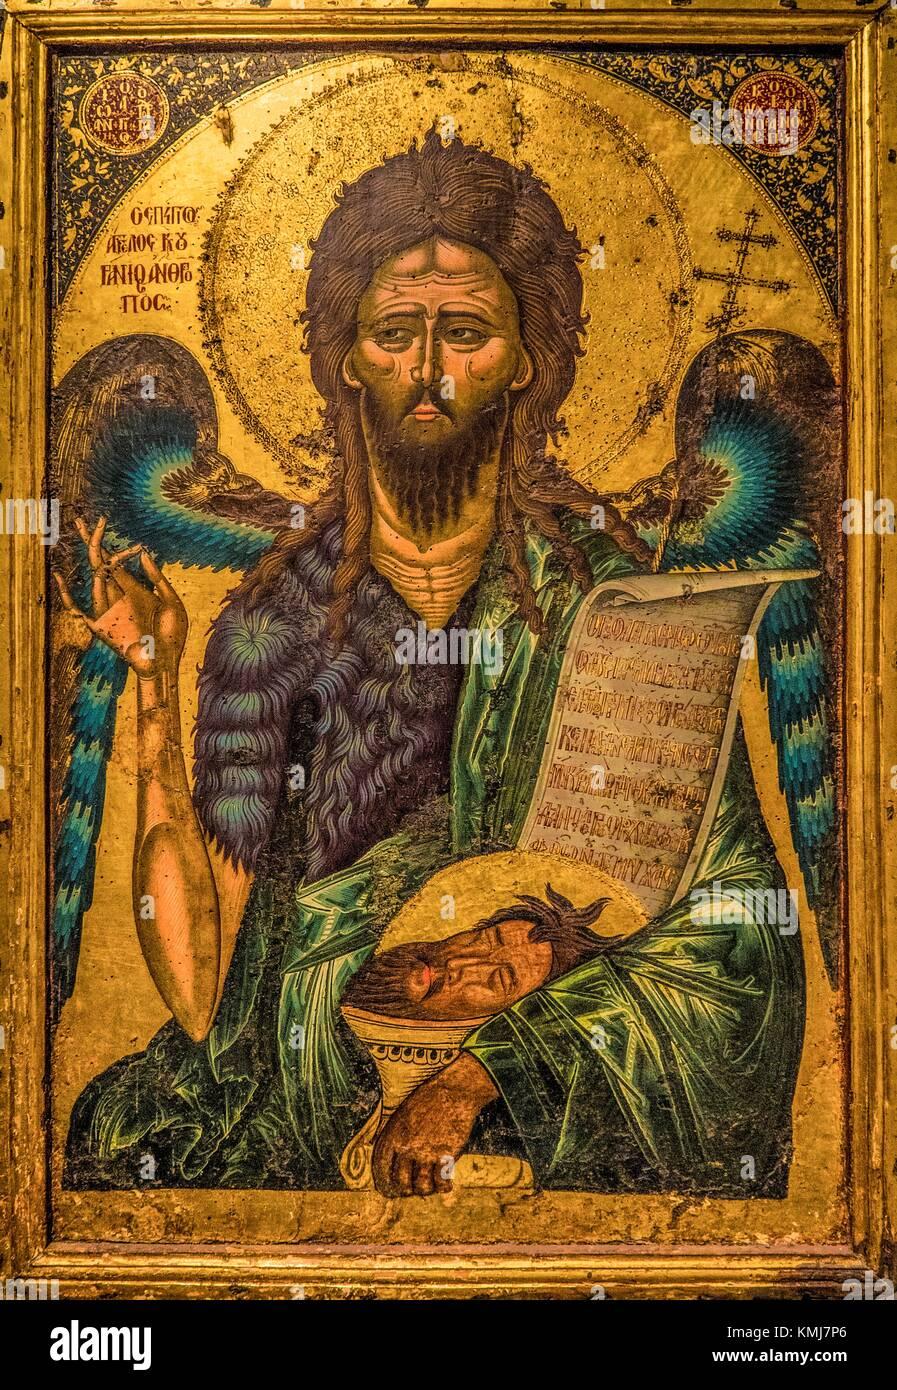 Albania, Berat- Onufri National Museum: Saint John the Baptist by Onufri, XVIc., the most important iconacaste painter - Stock Image